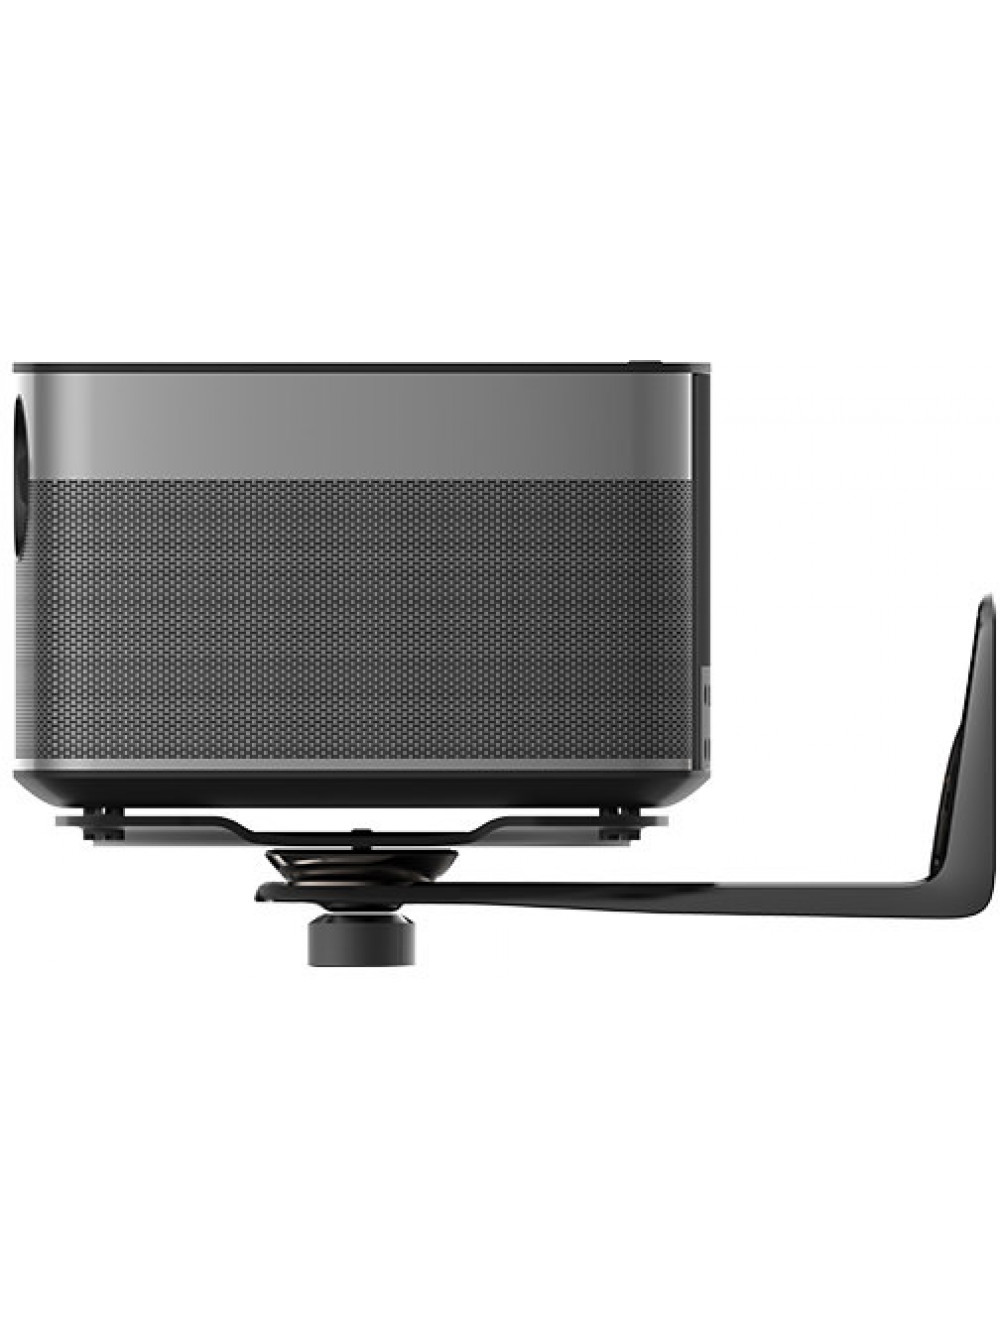 Wall stand XGIMI (настенное крепление для проектора)